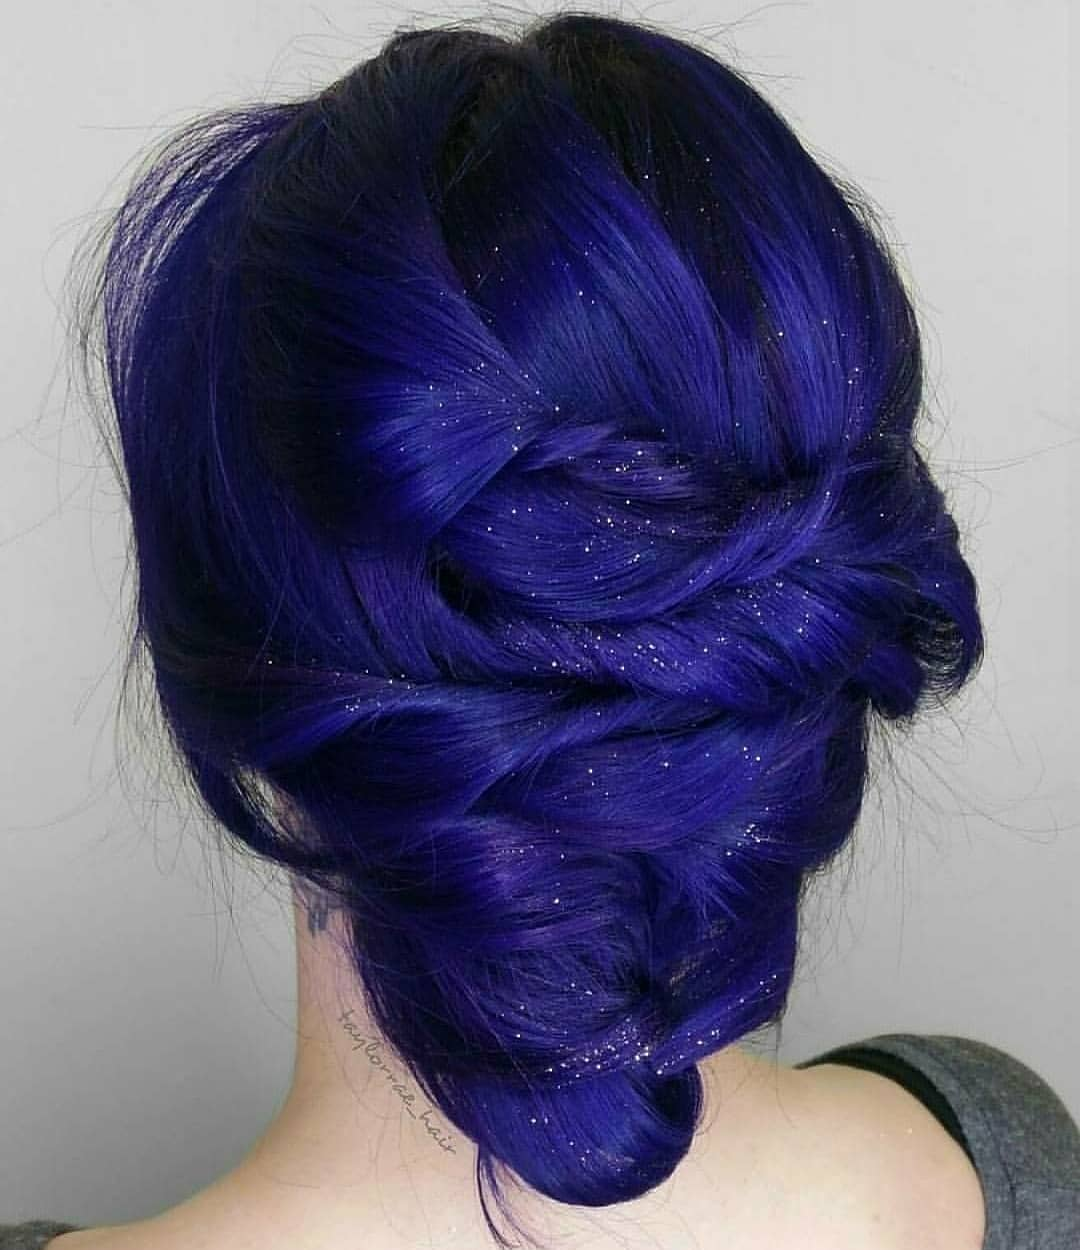 ženske frizure sa šljokicama (7)